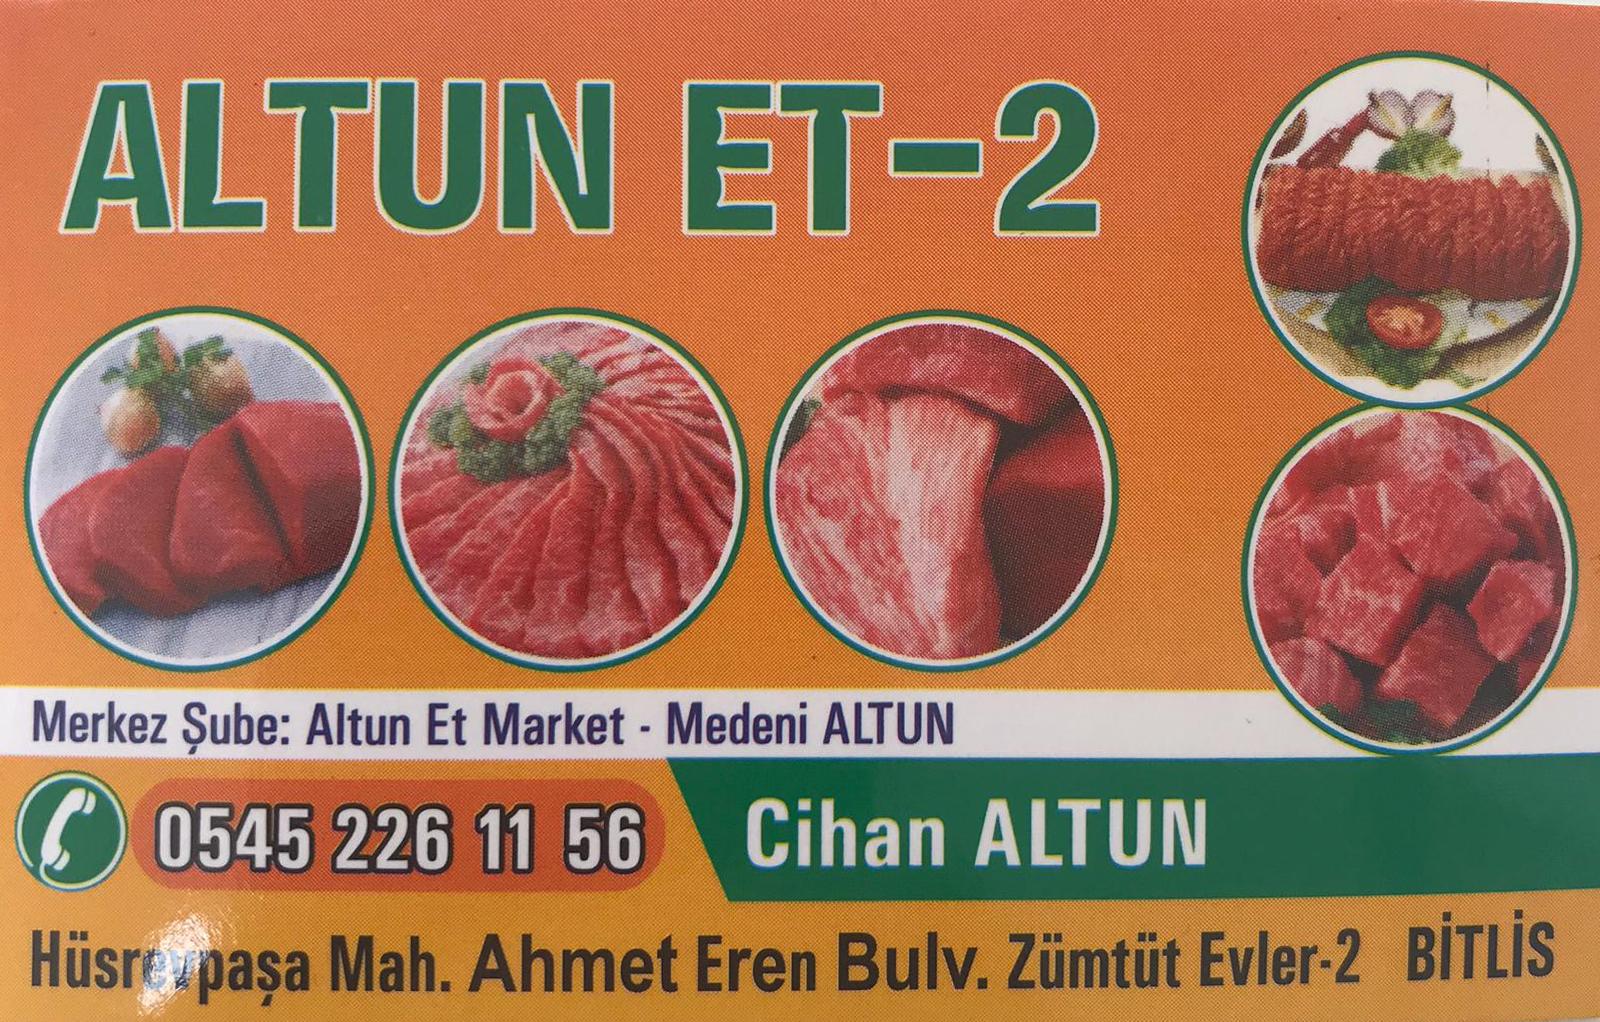 Altun Et Market 2